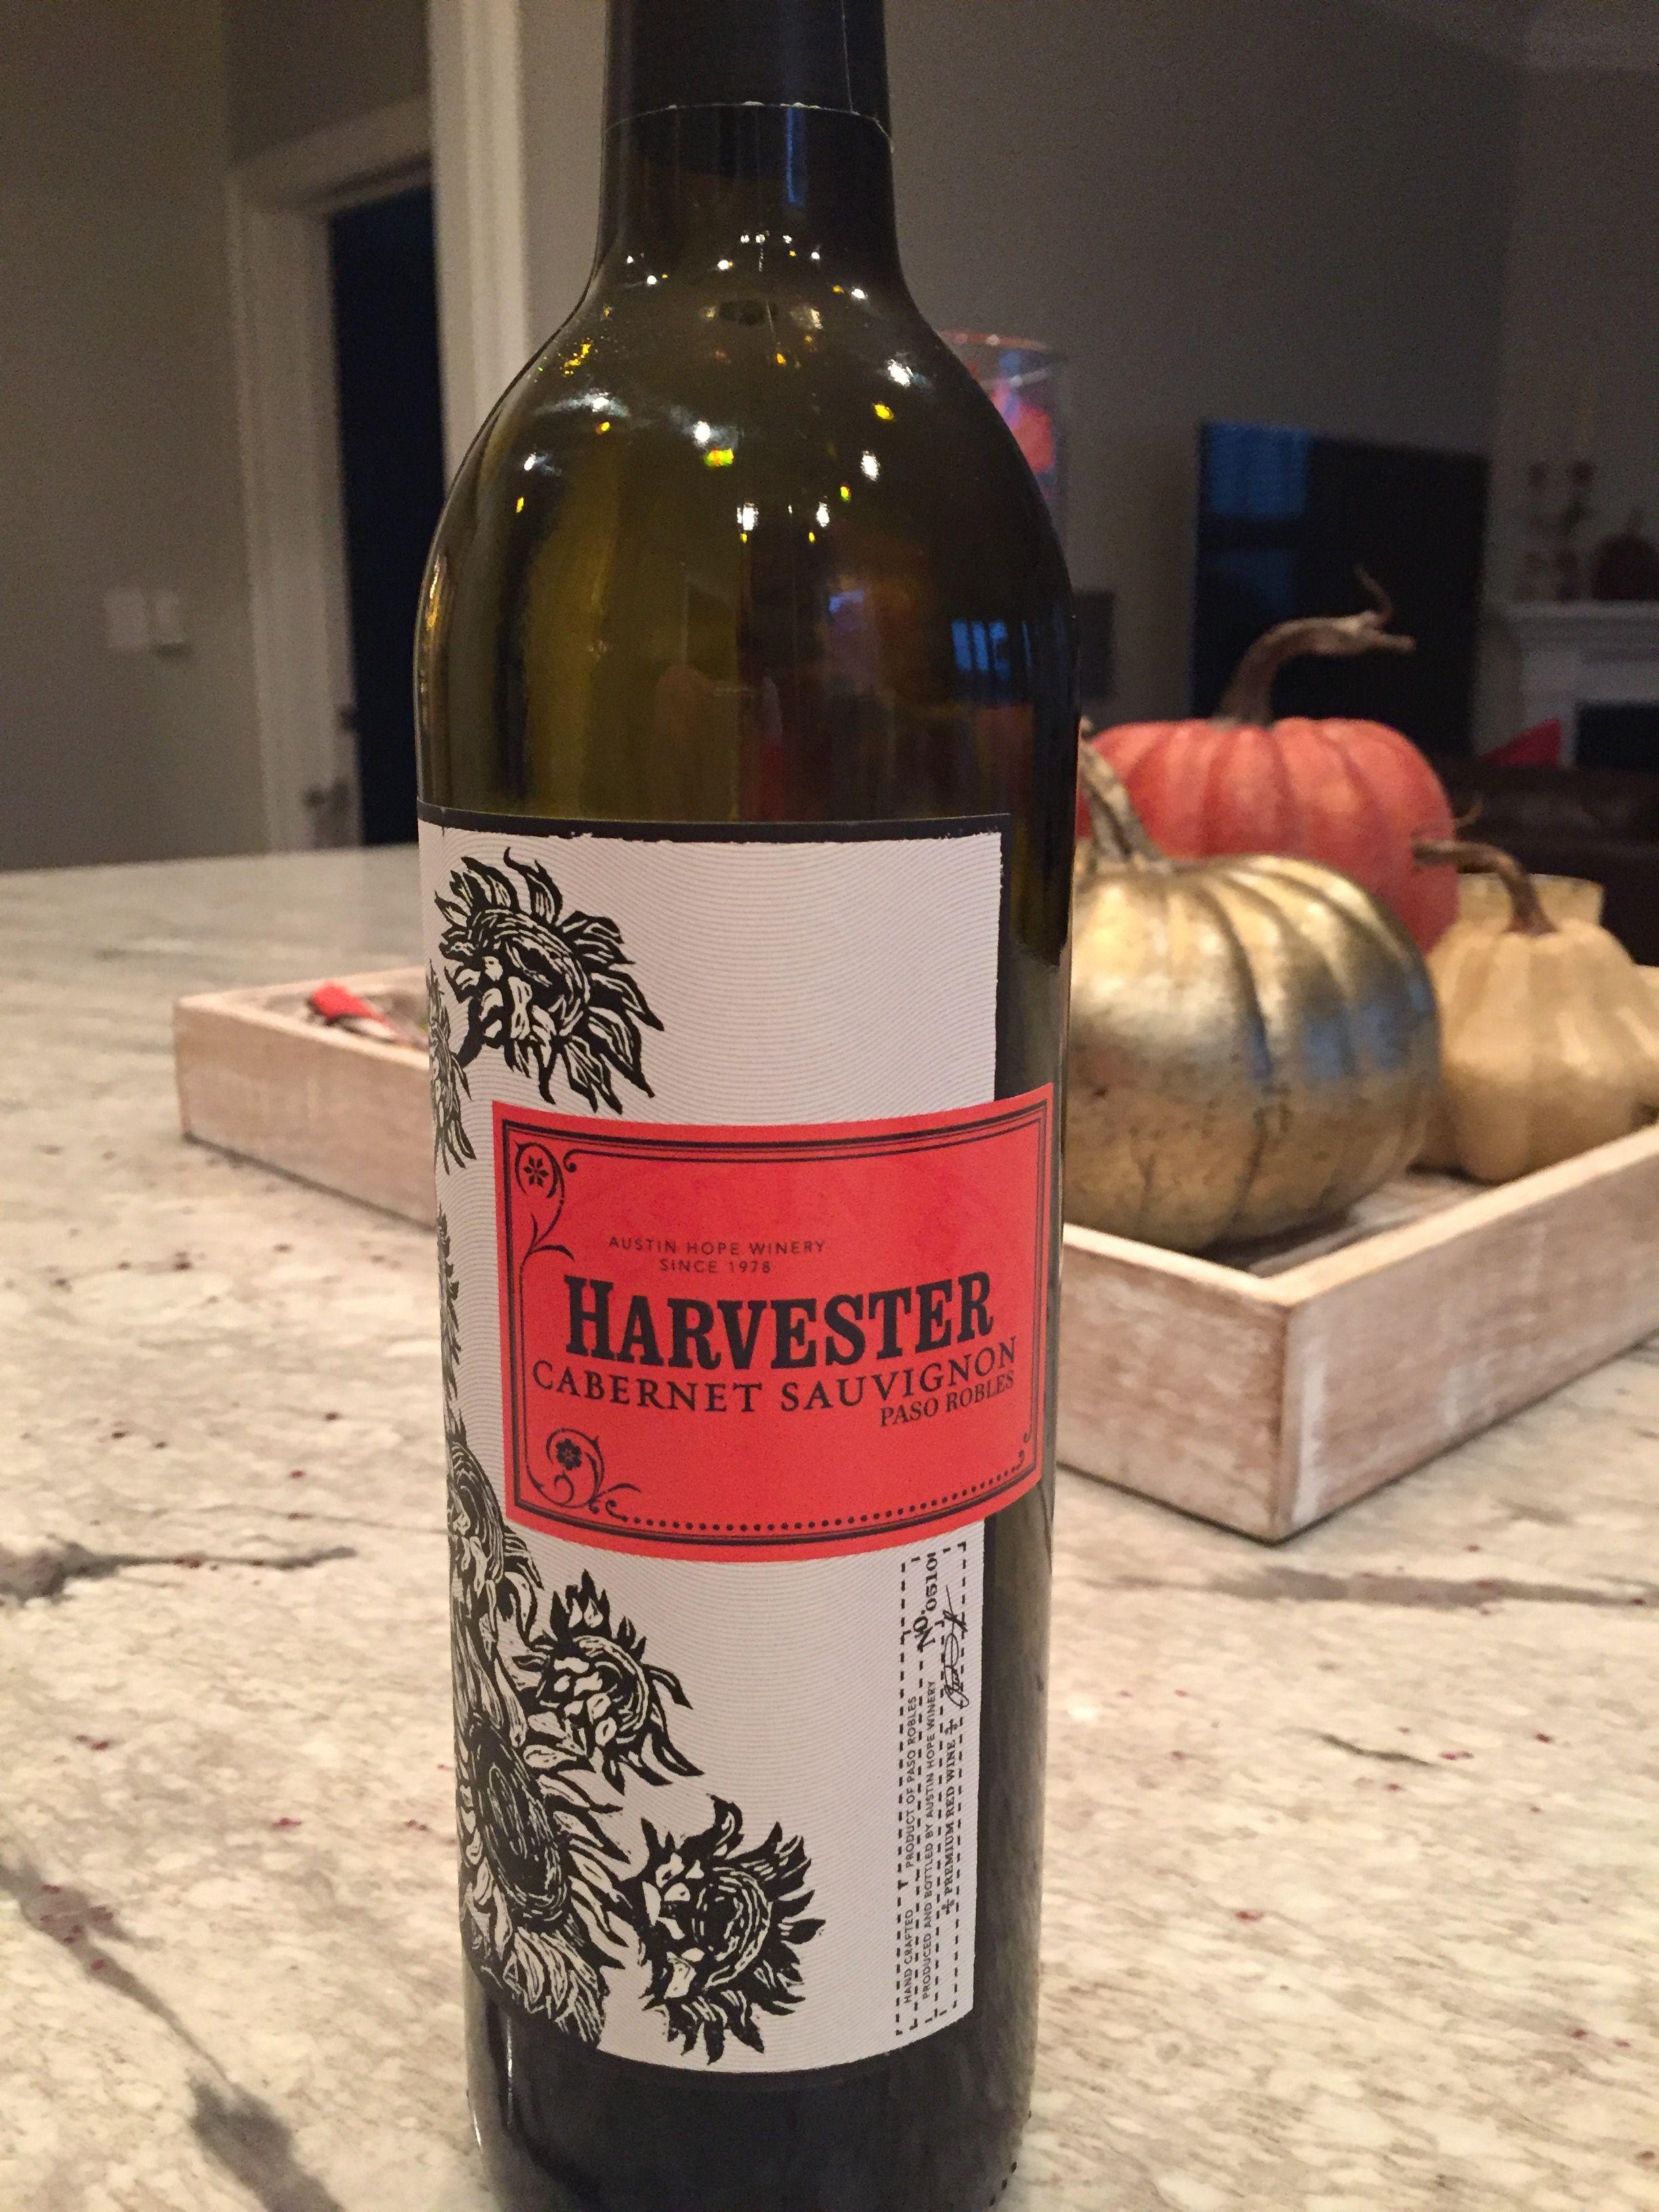 Pin By Jennifer Painter On Wine Wine Bottle Cabernet Sauvignon Sauvignon